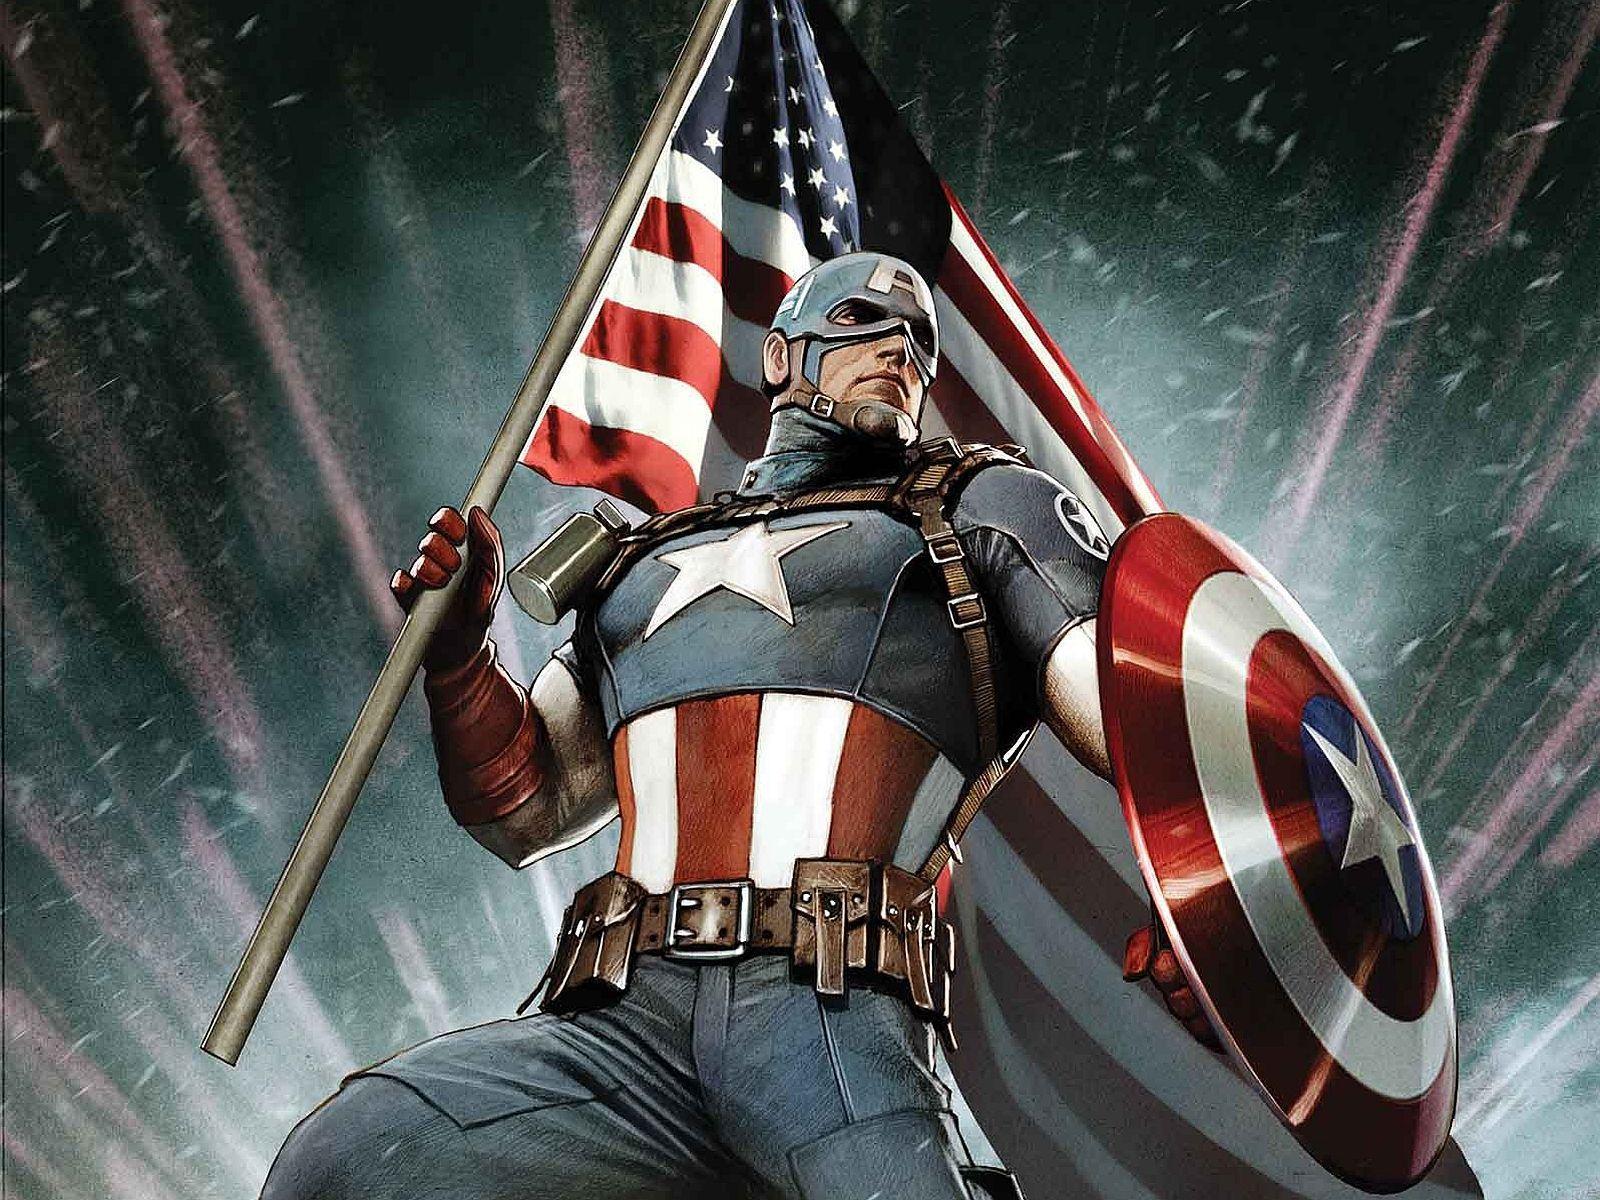 Marvel Revela Teaser De Avengers Endgame Enfocado En El